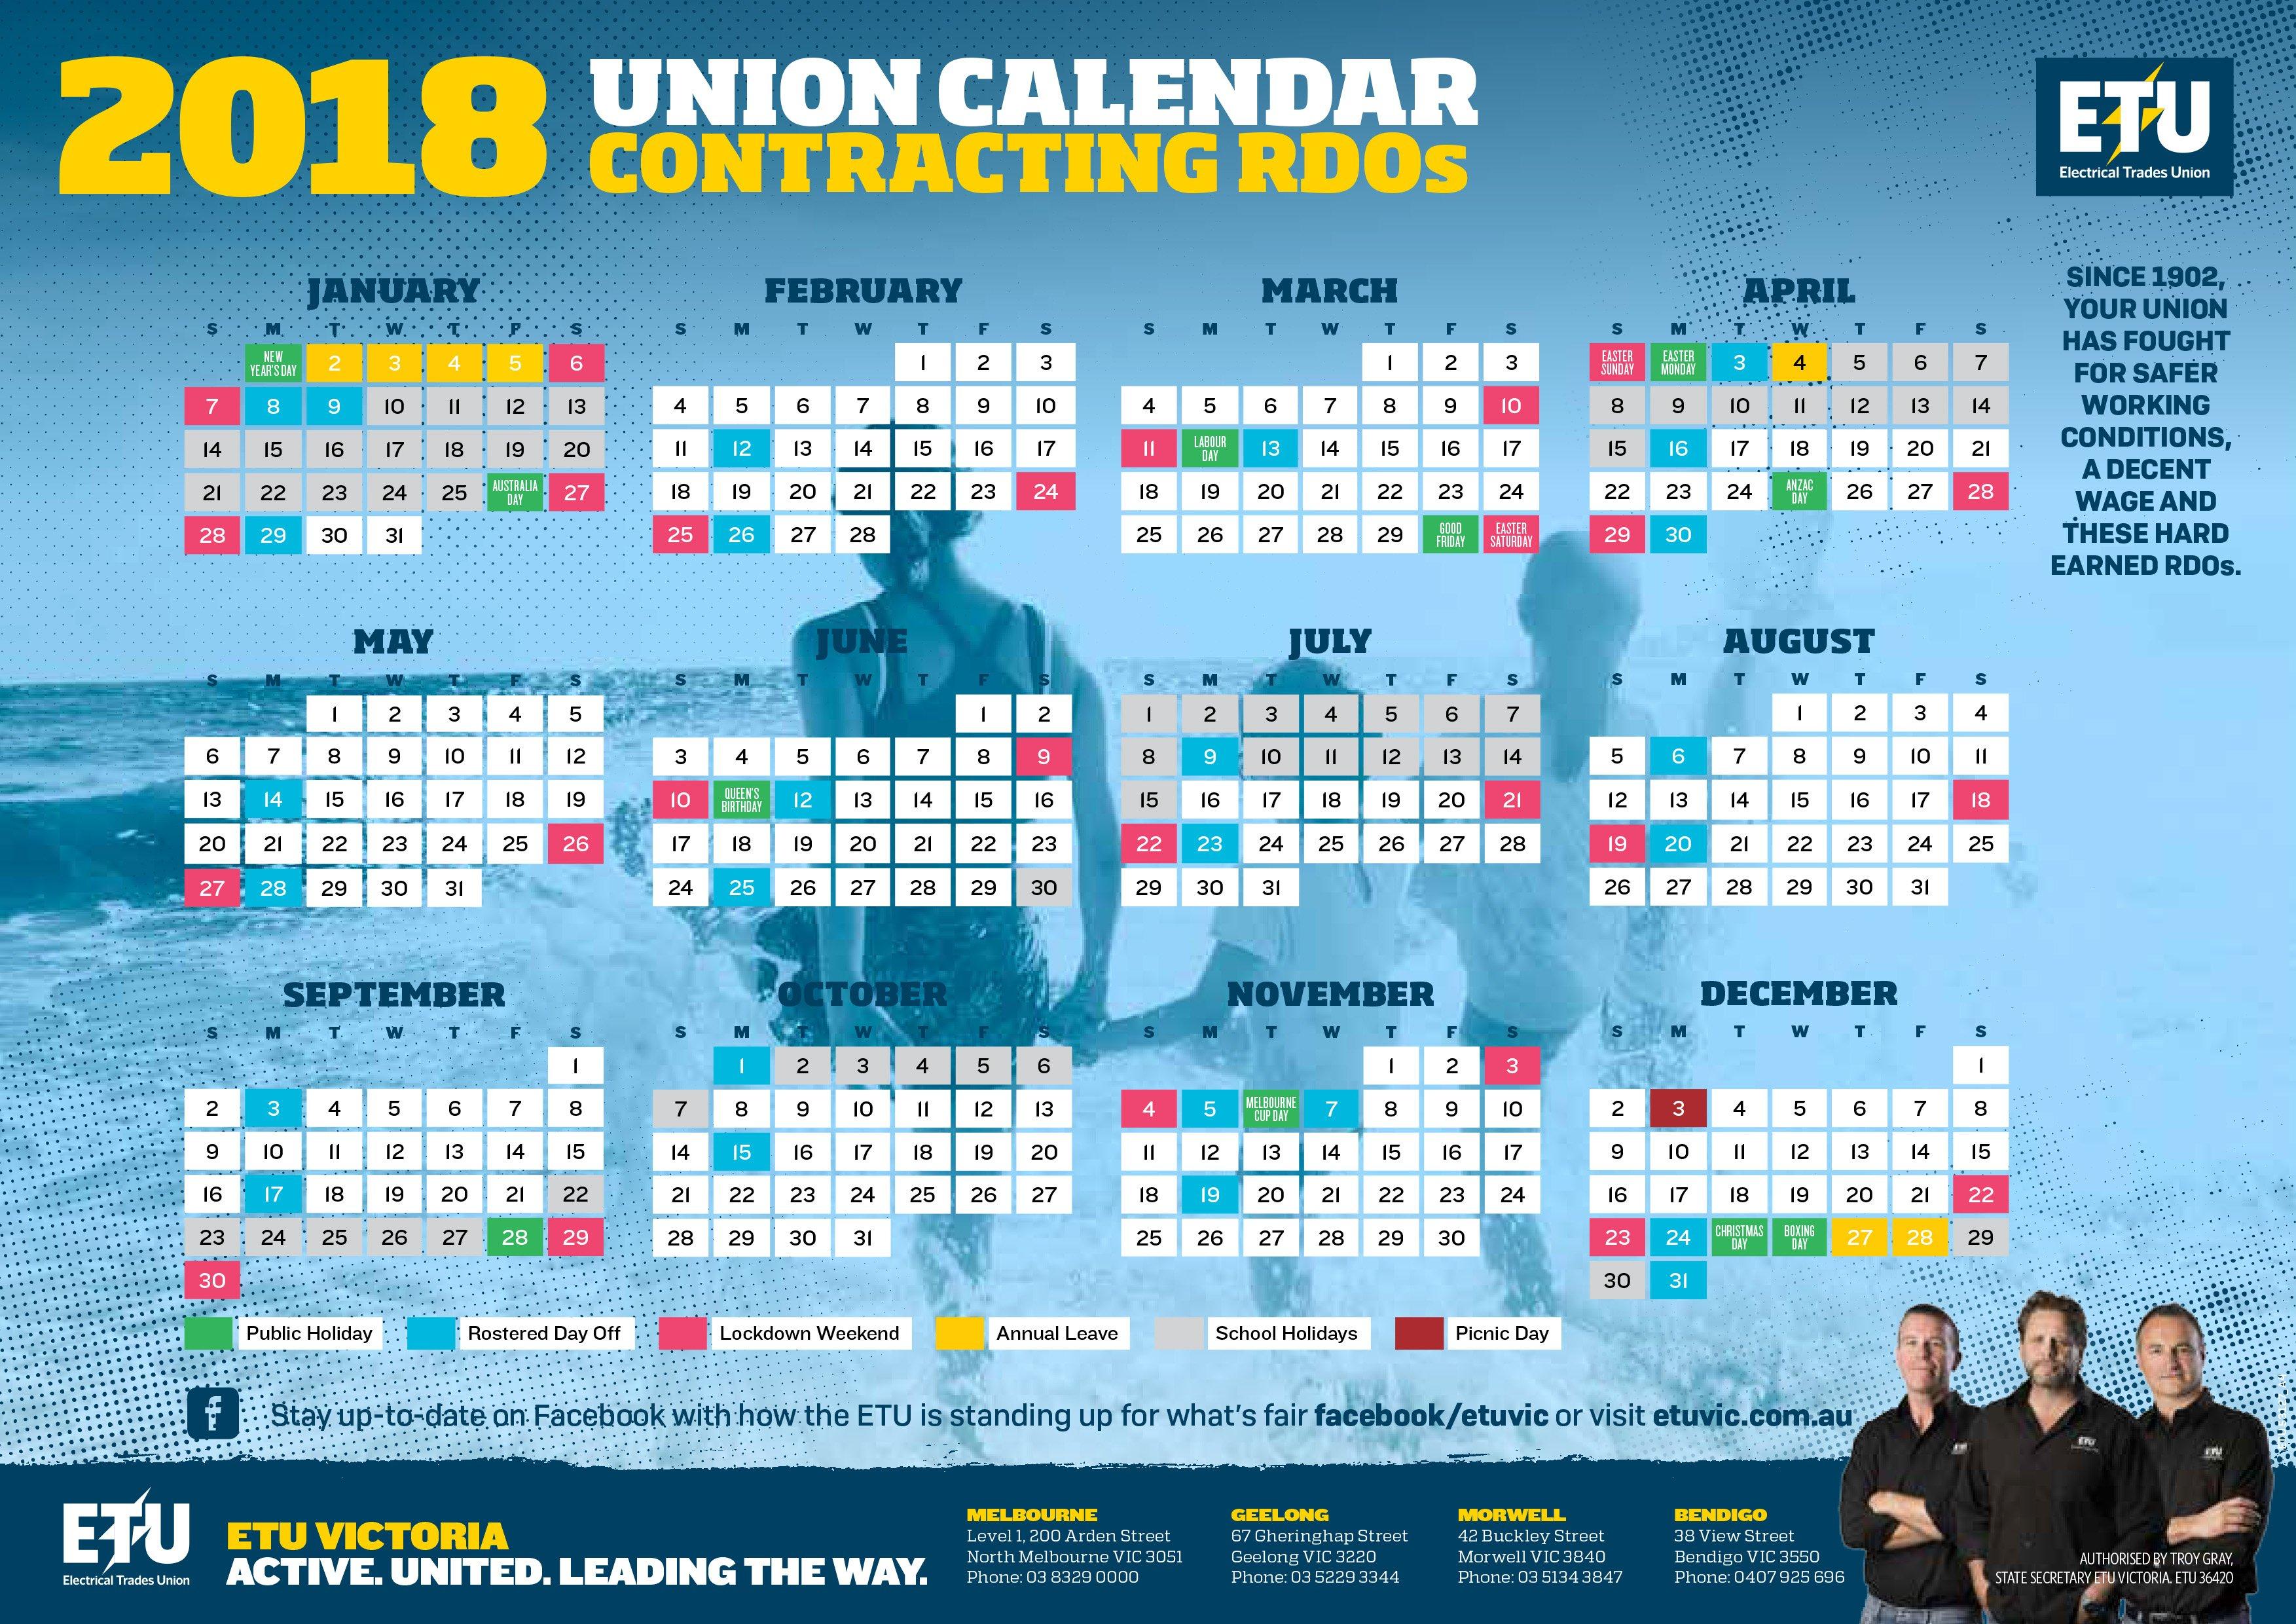 Contracting Rdo Calendar U Of R Calendar 2019